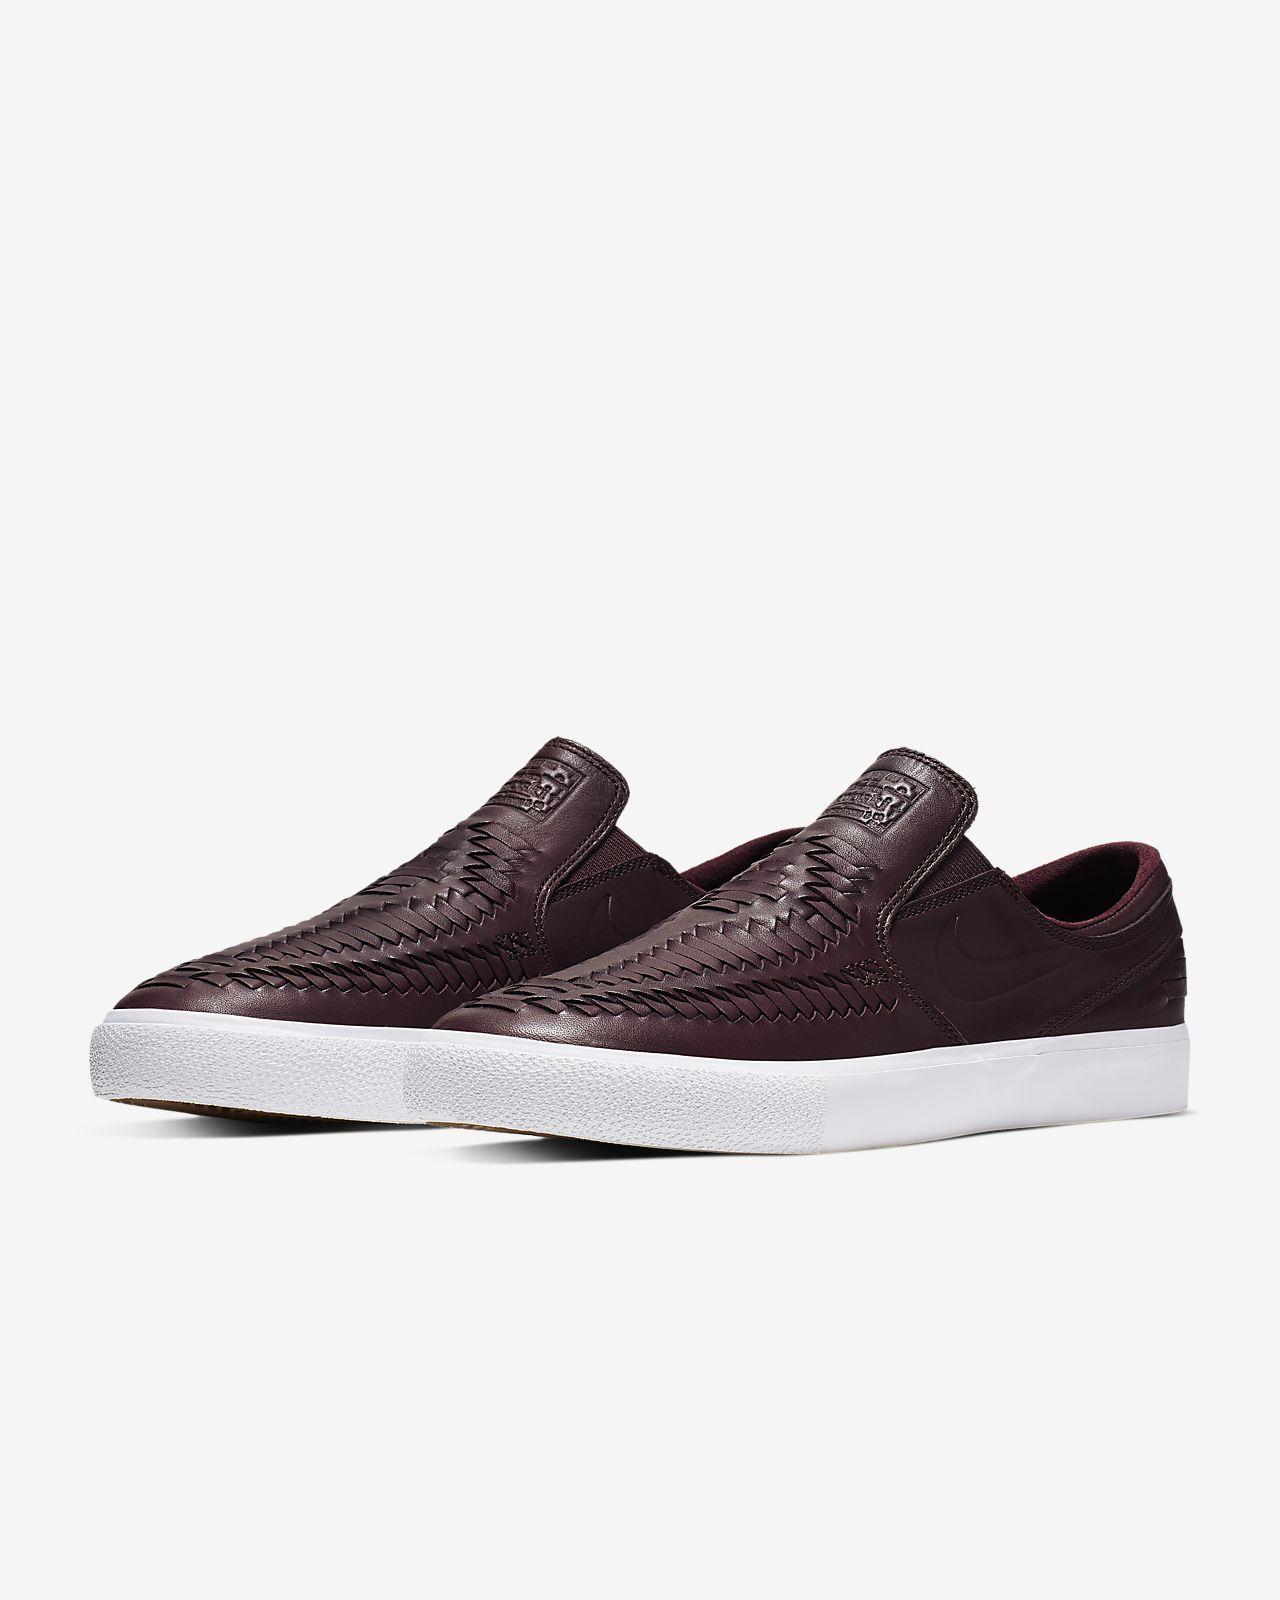 Buty do skateboardingu Nike SB Zoom Stefan Janoski Slip RM Crafted